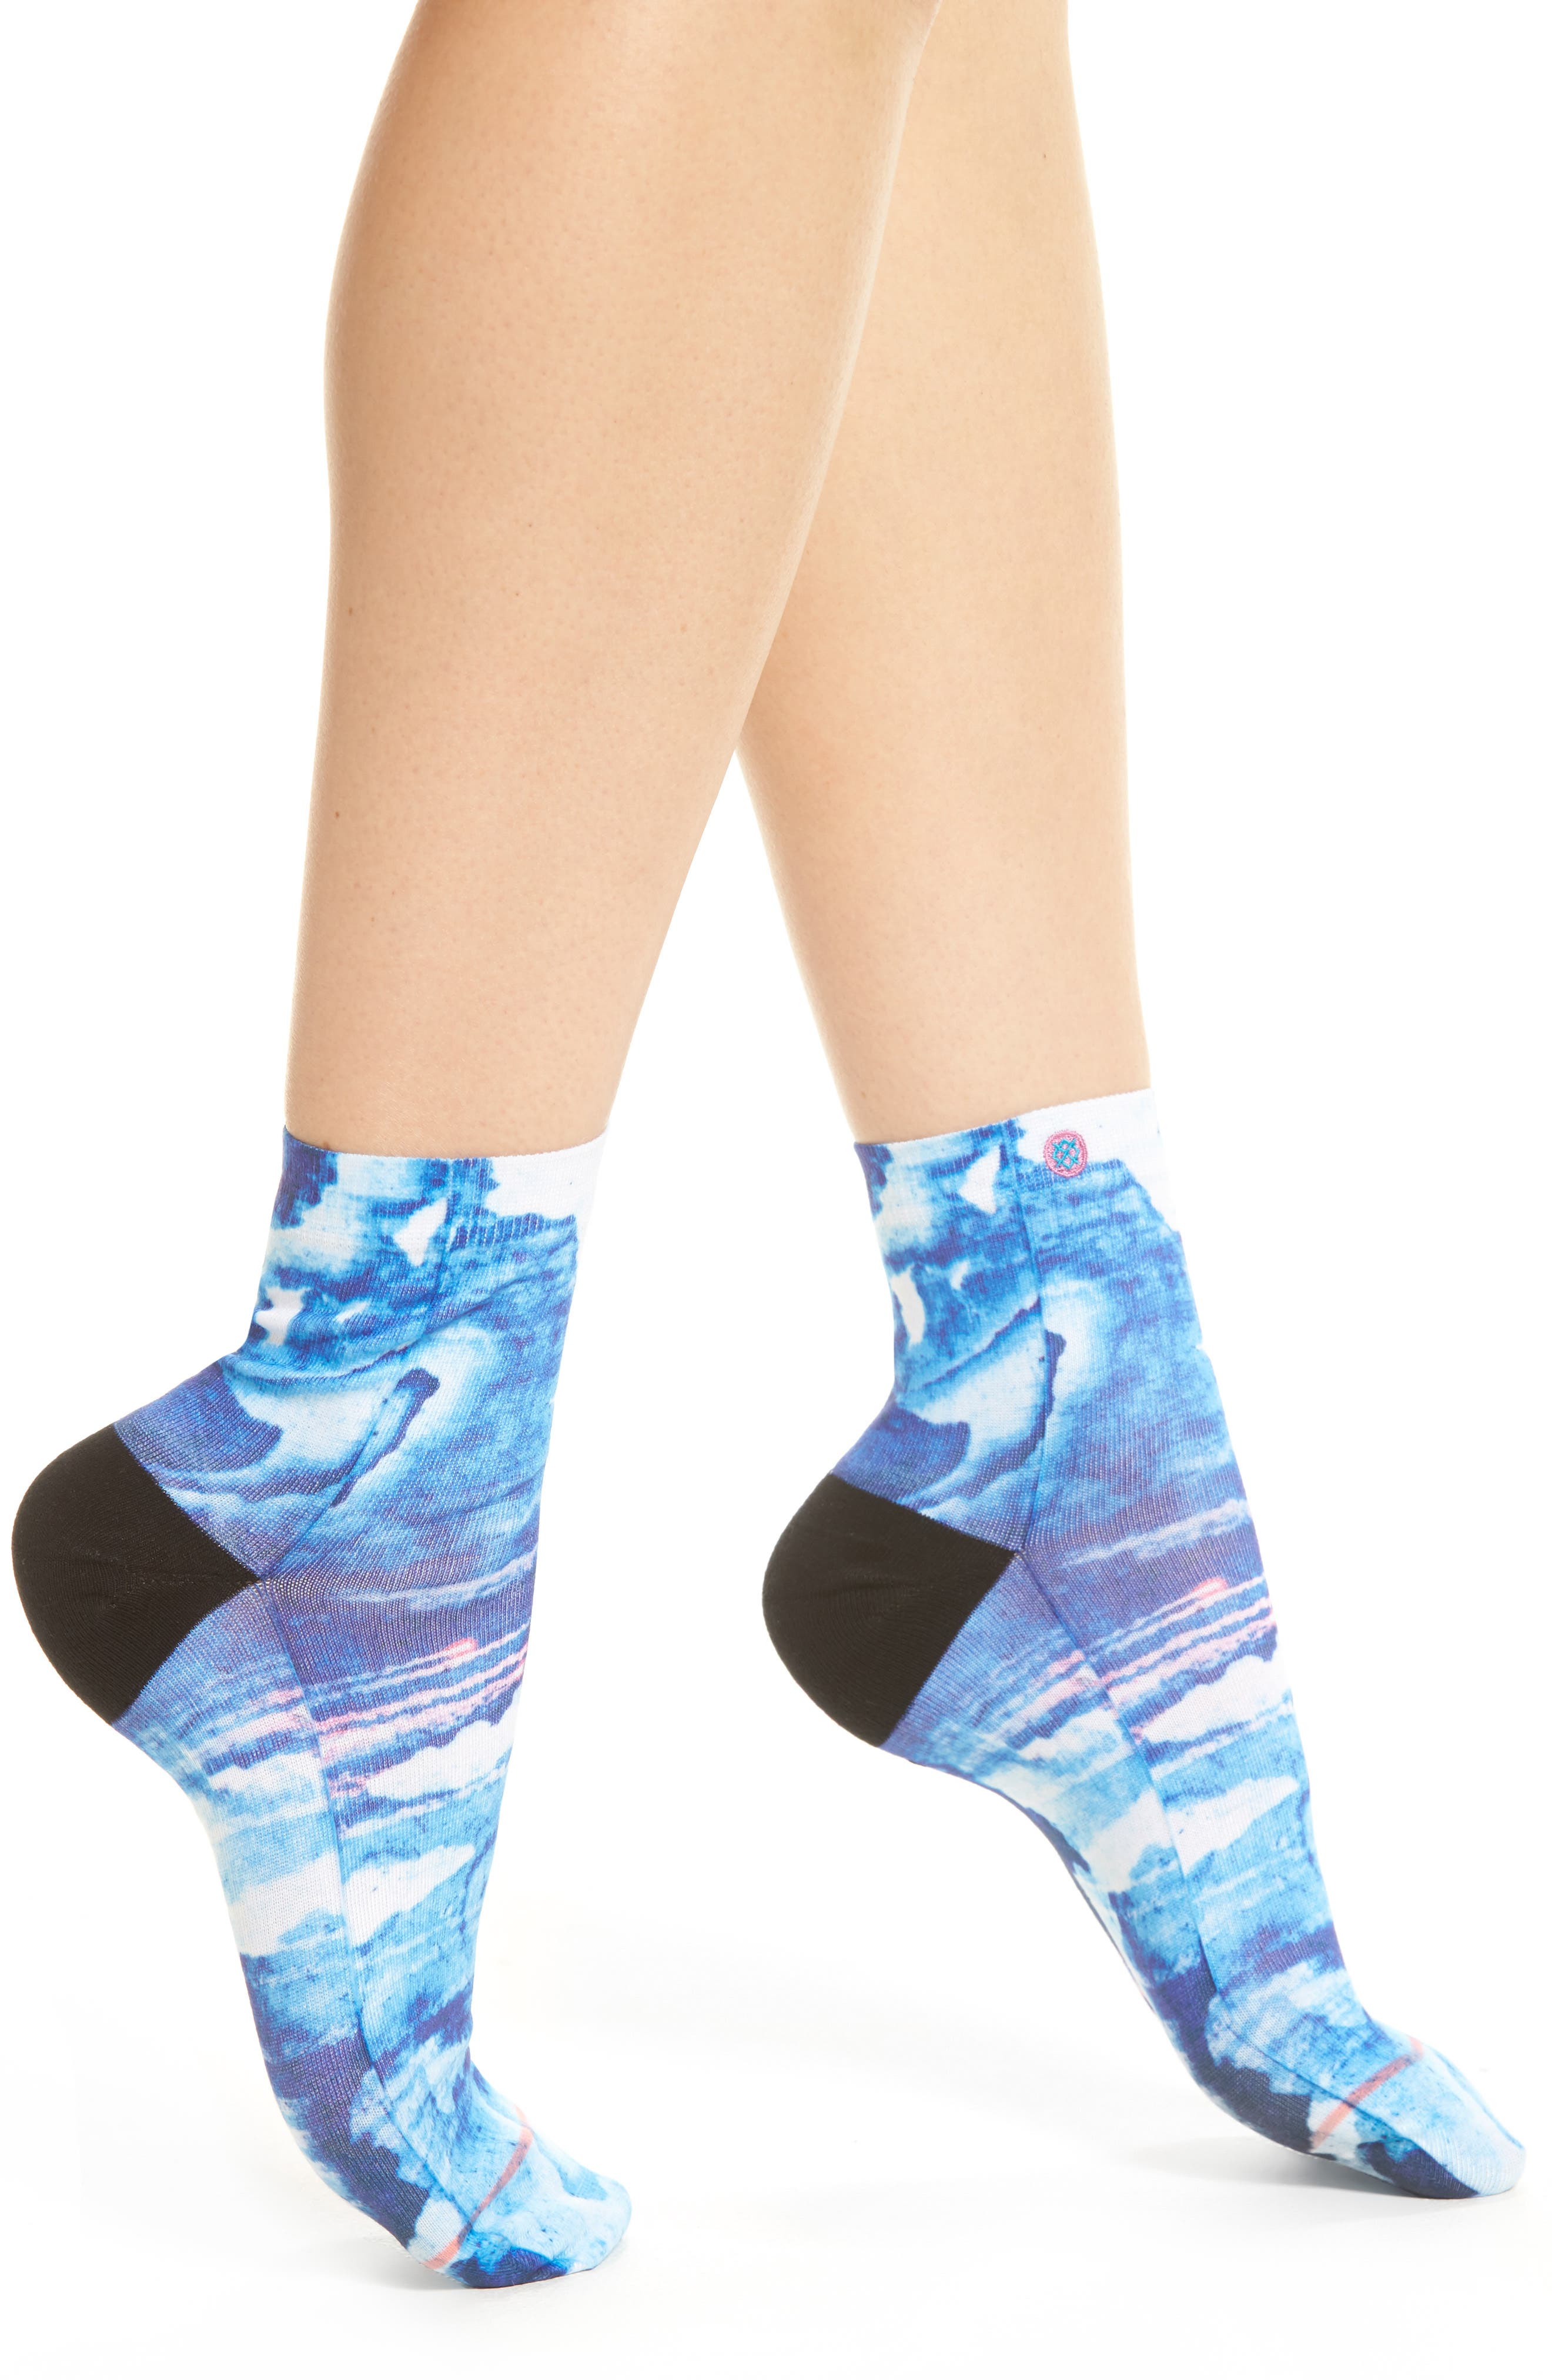 Tropic Storm Ankle Socks,                             Main thumbnail 1, color,                             Blue